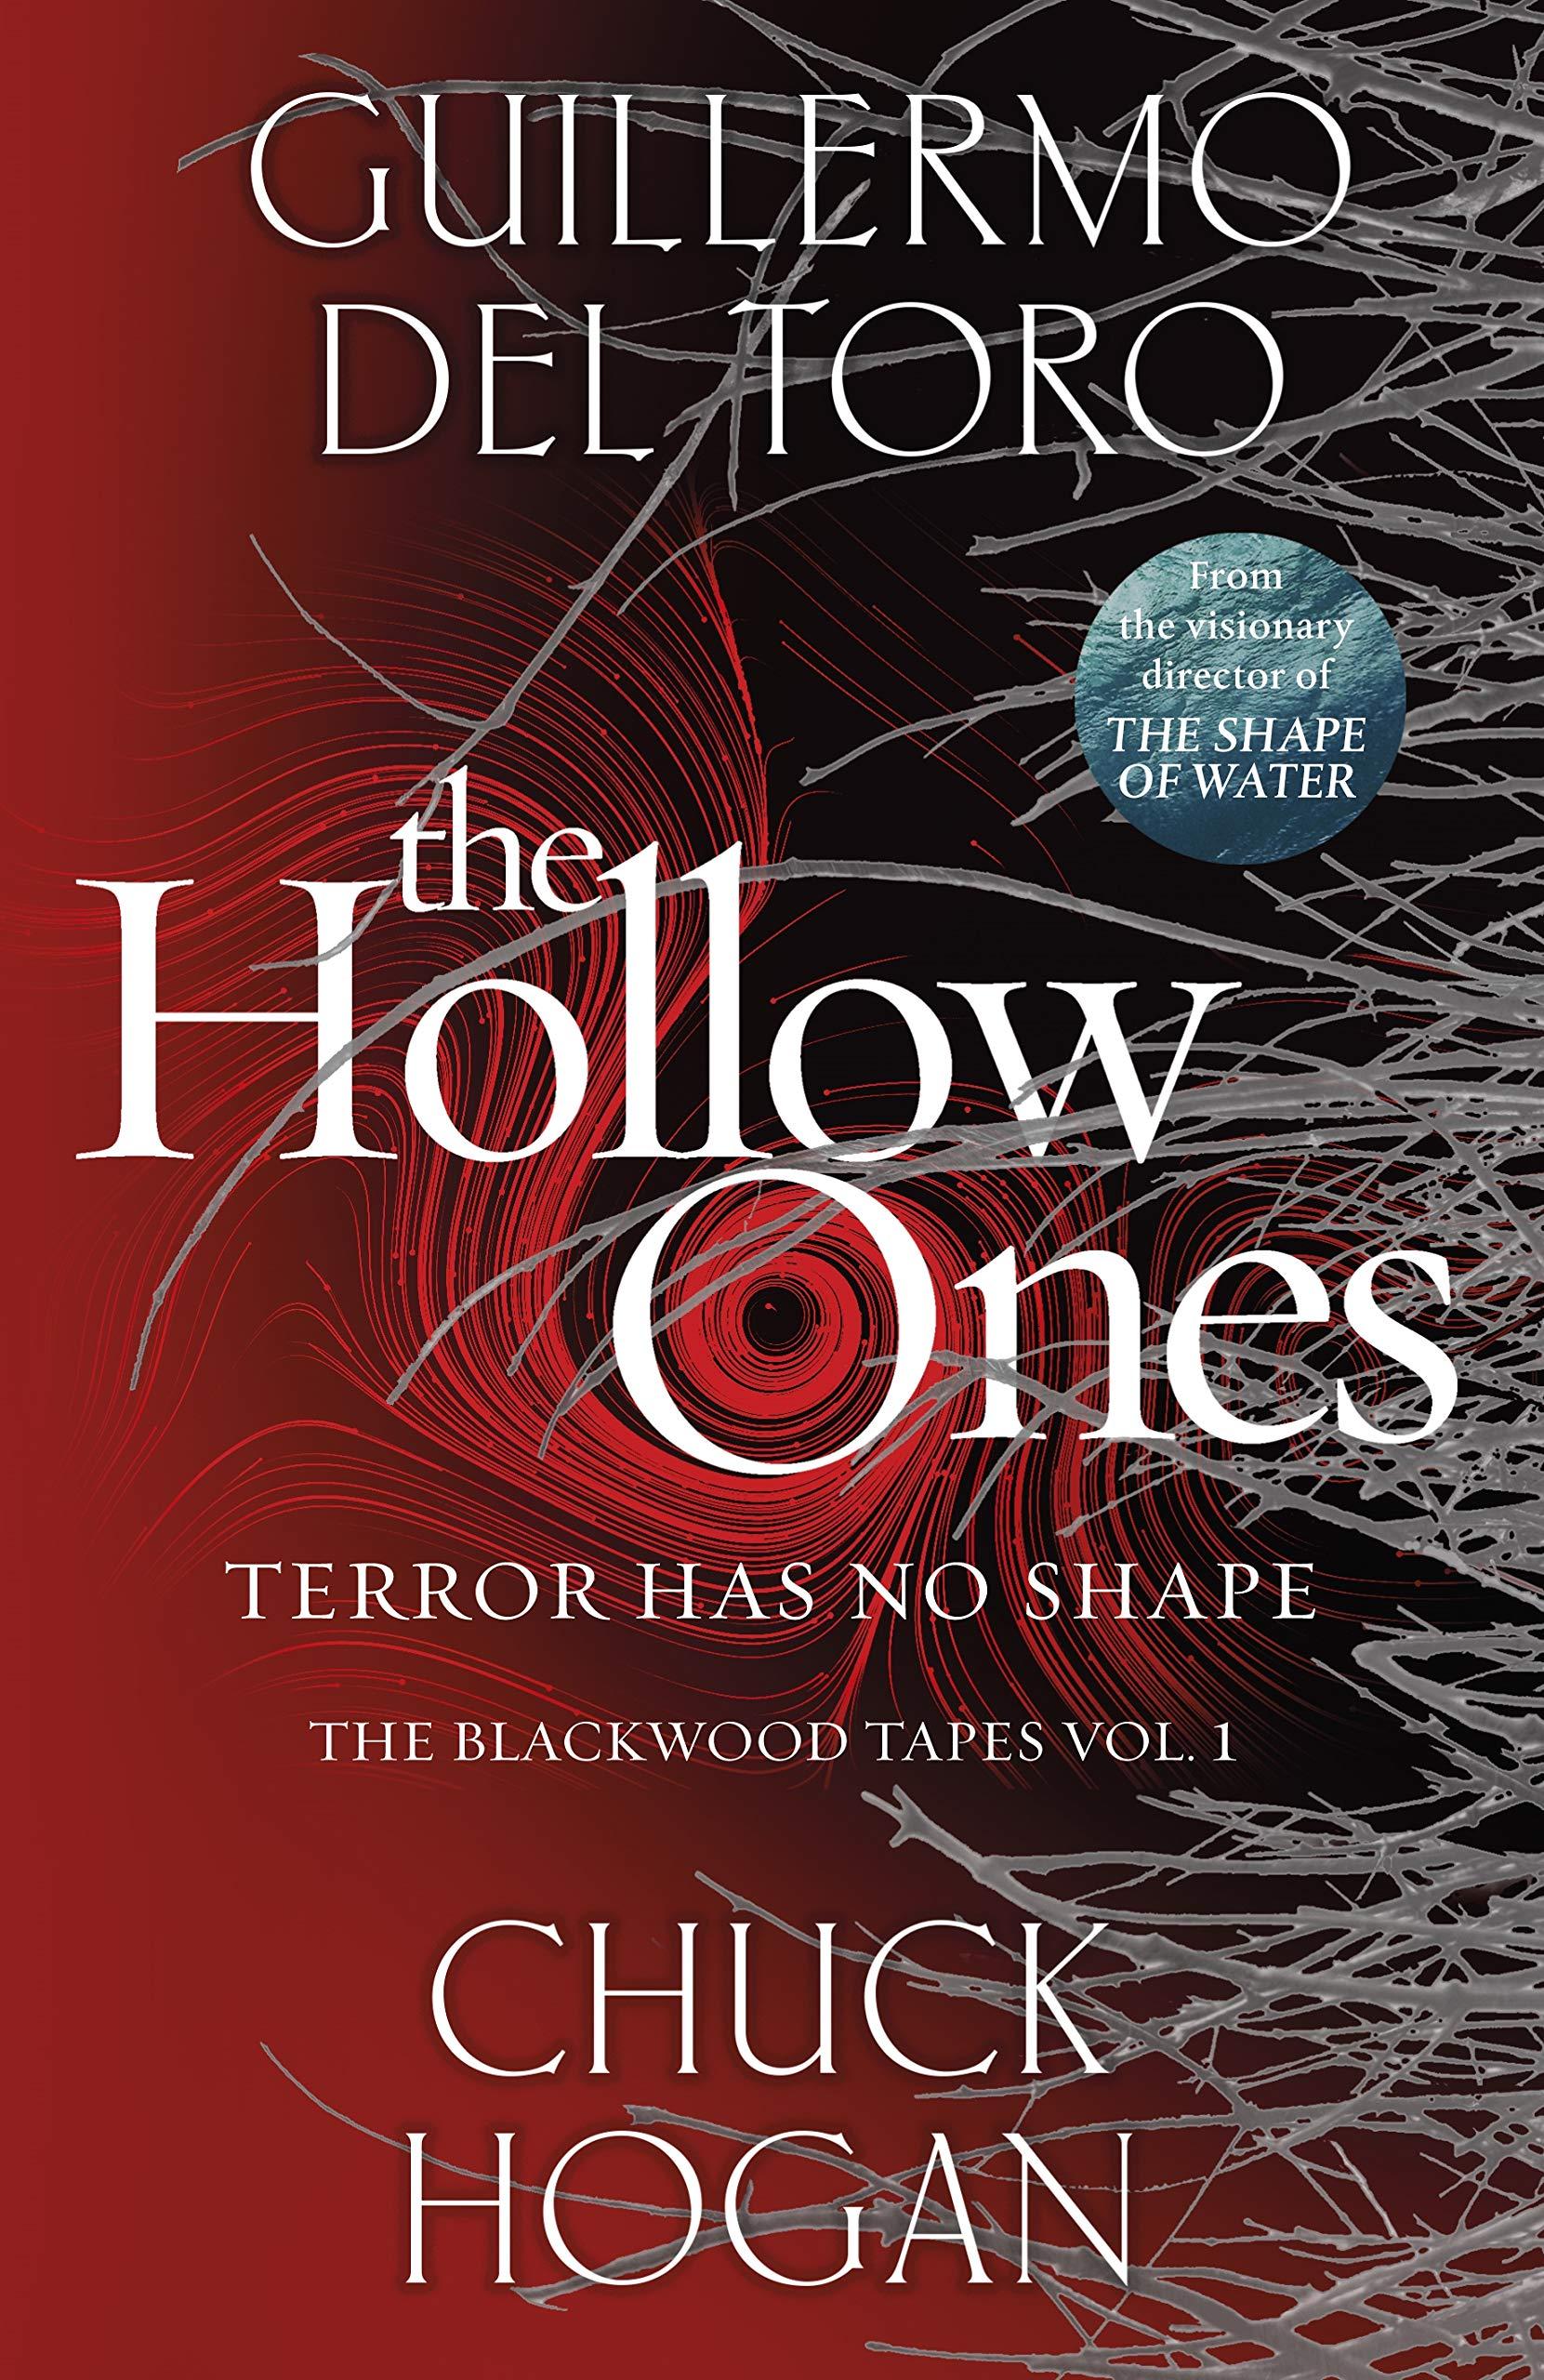 The Hollow Ones: Amazon.co.uk: Toro, Guillermo del, Hogan, Chuck ...